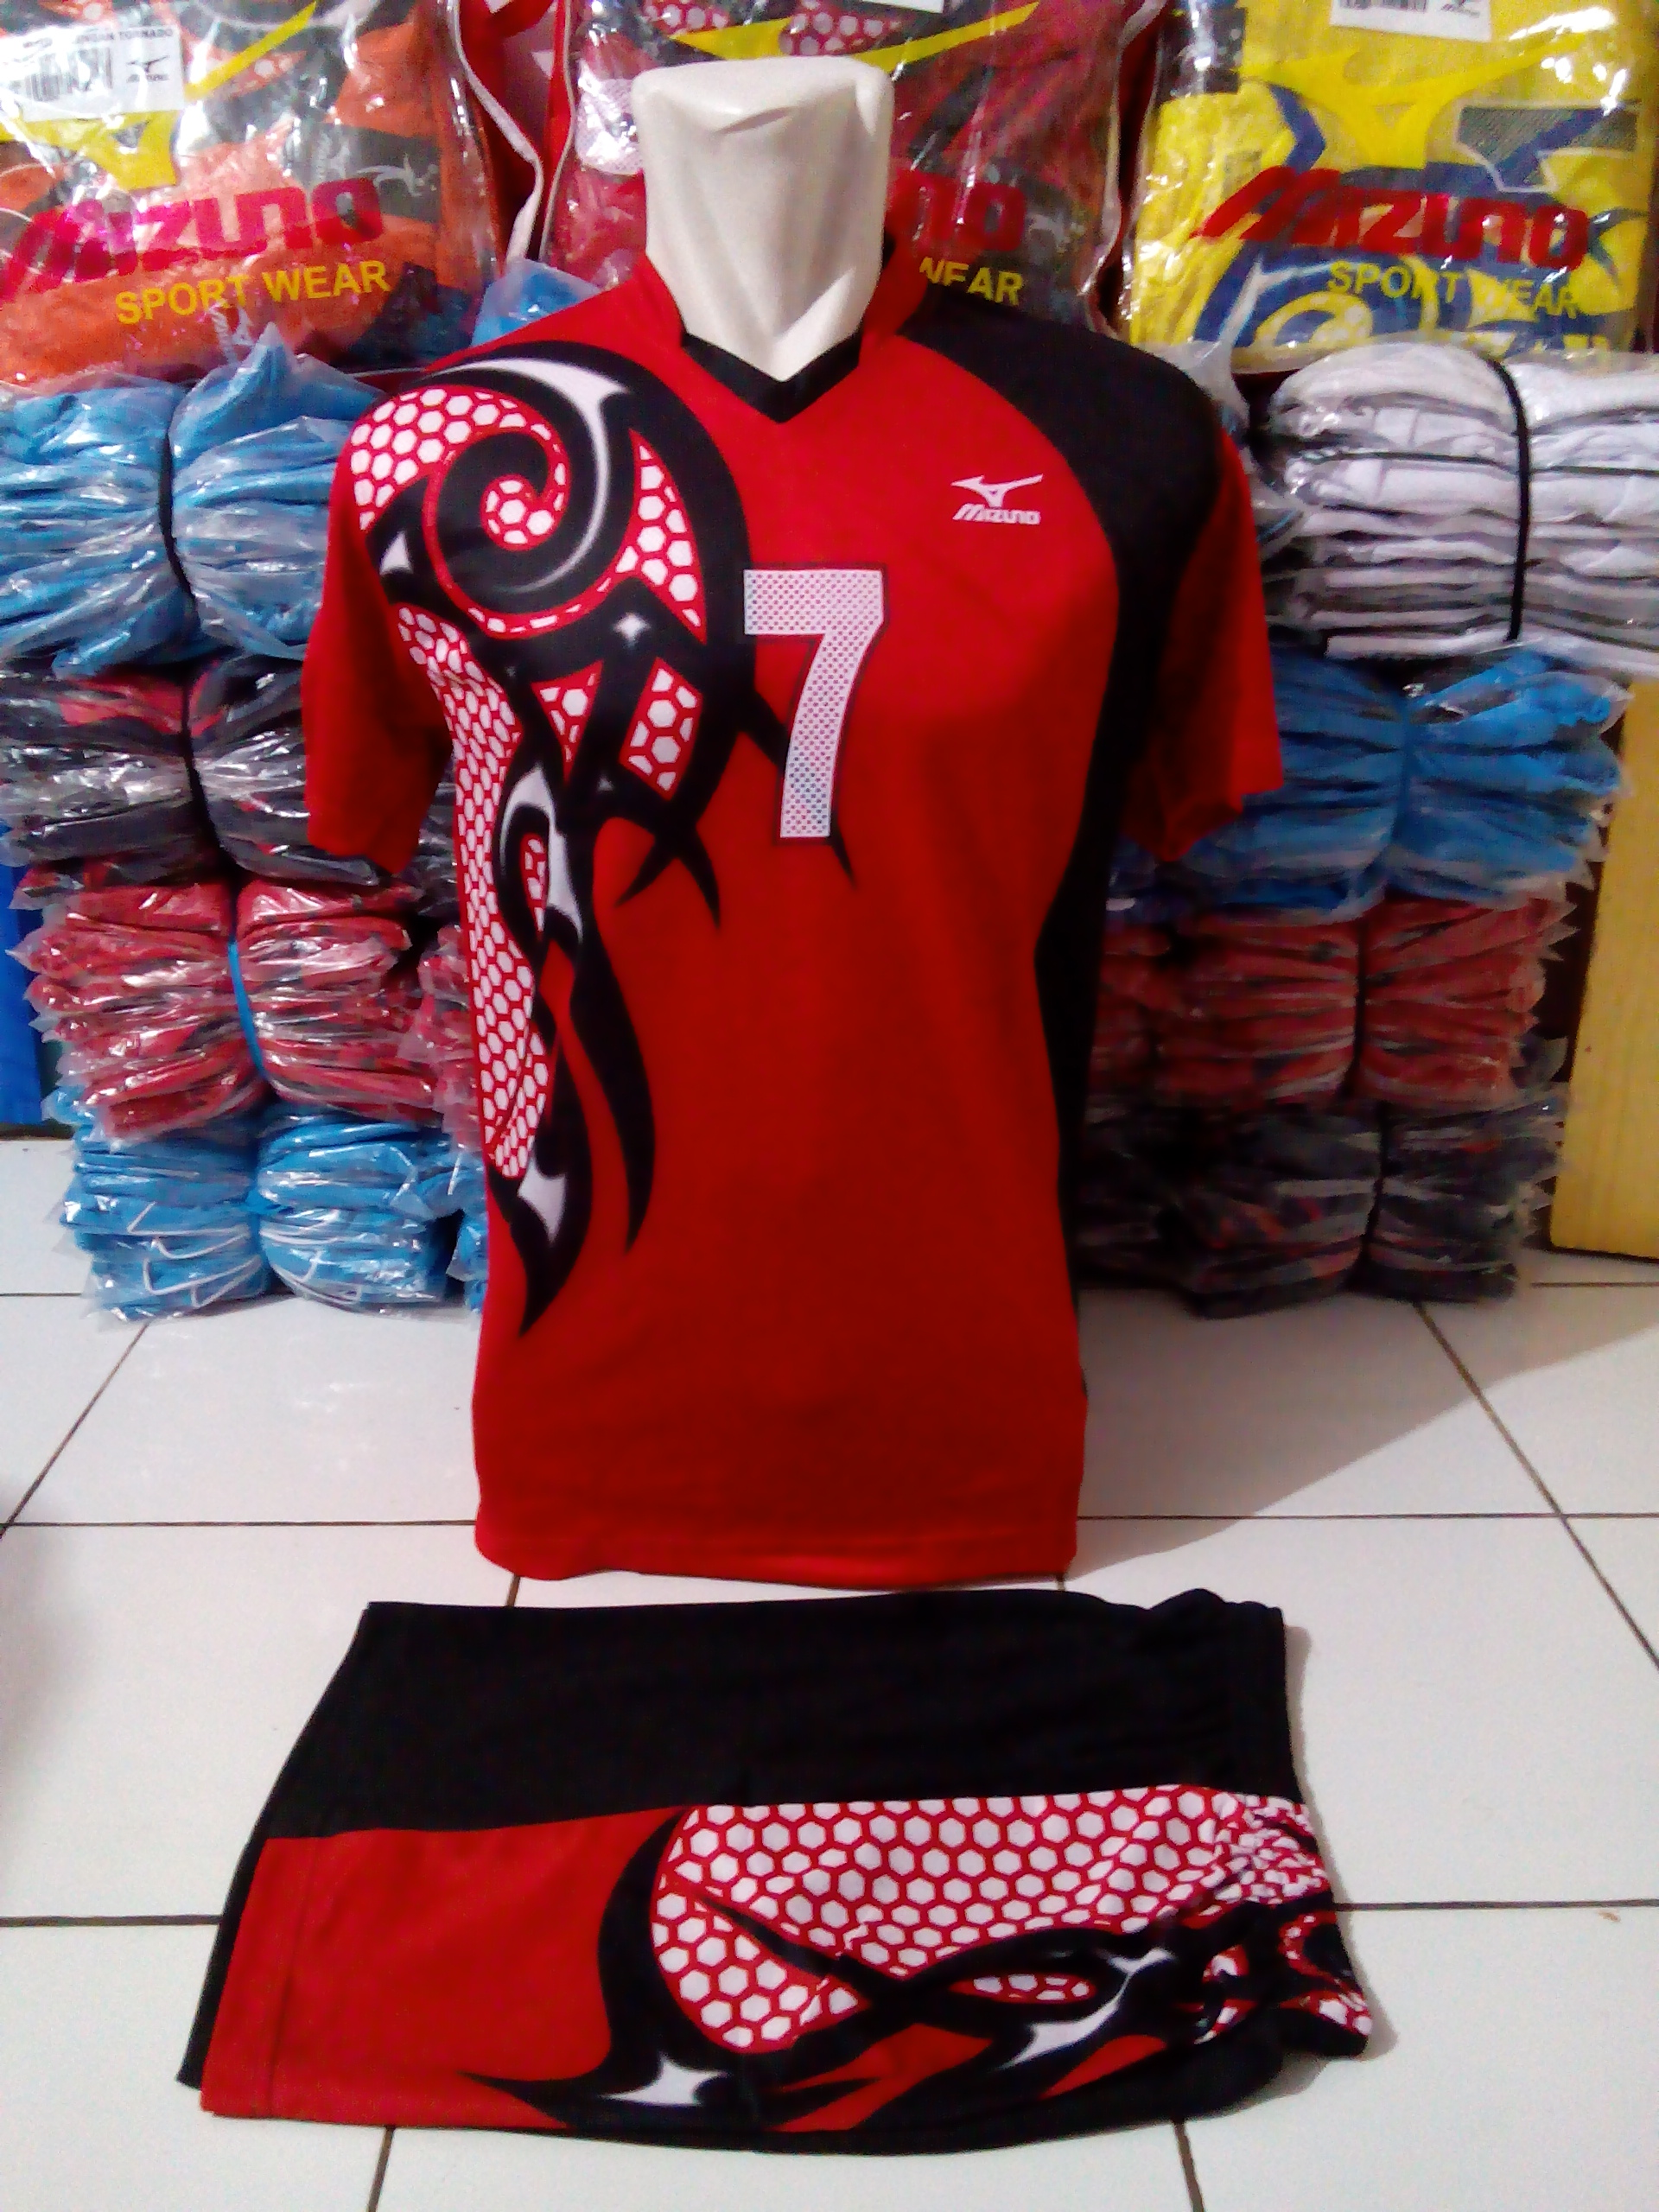 Buy Kaos Voli Mizuno Terbaru 57 Off Fitur Baju Olahraga Jersey Sepak Bola Setelan Futsal Volly